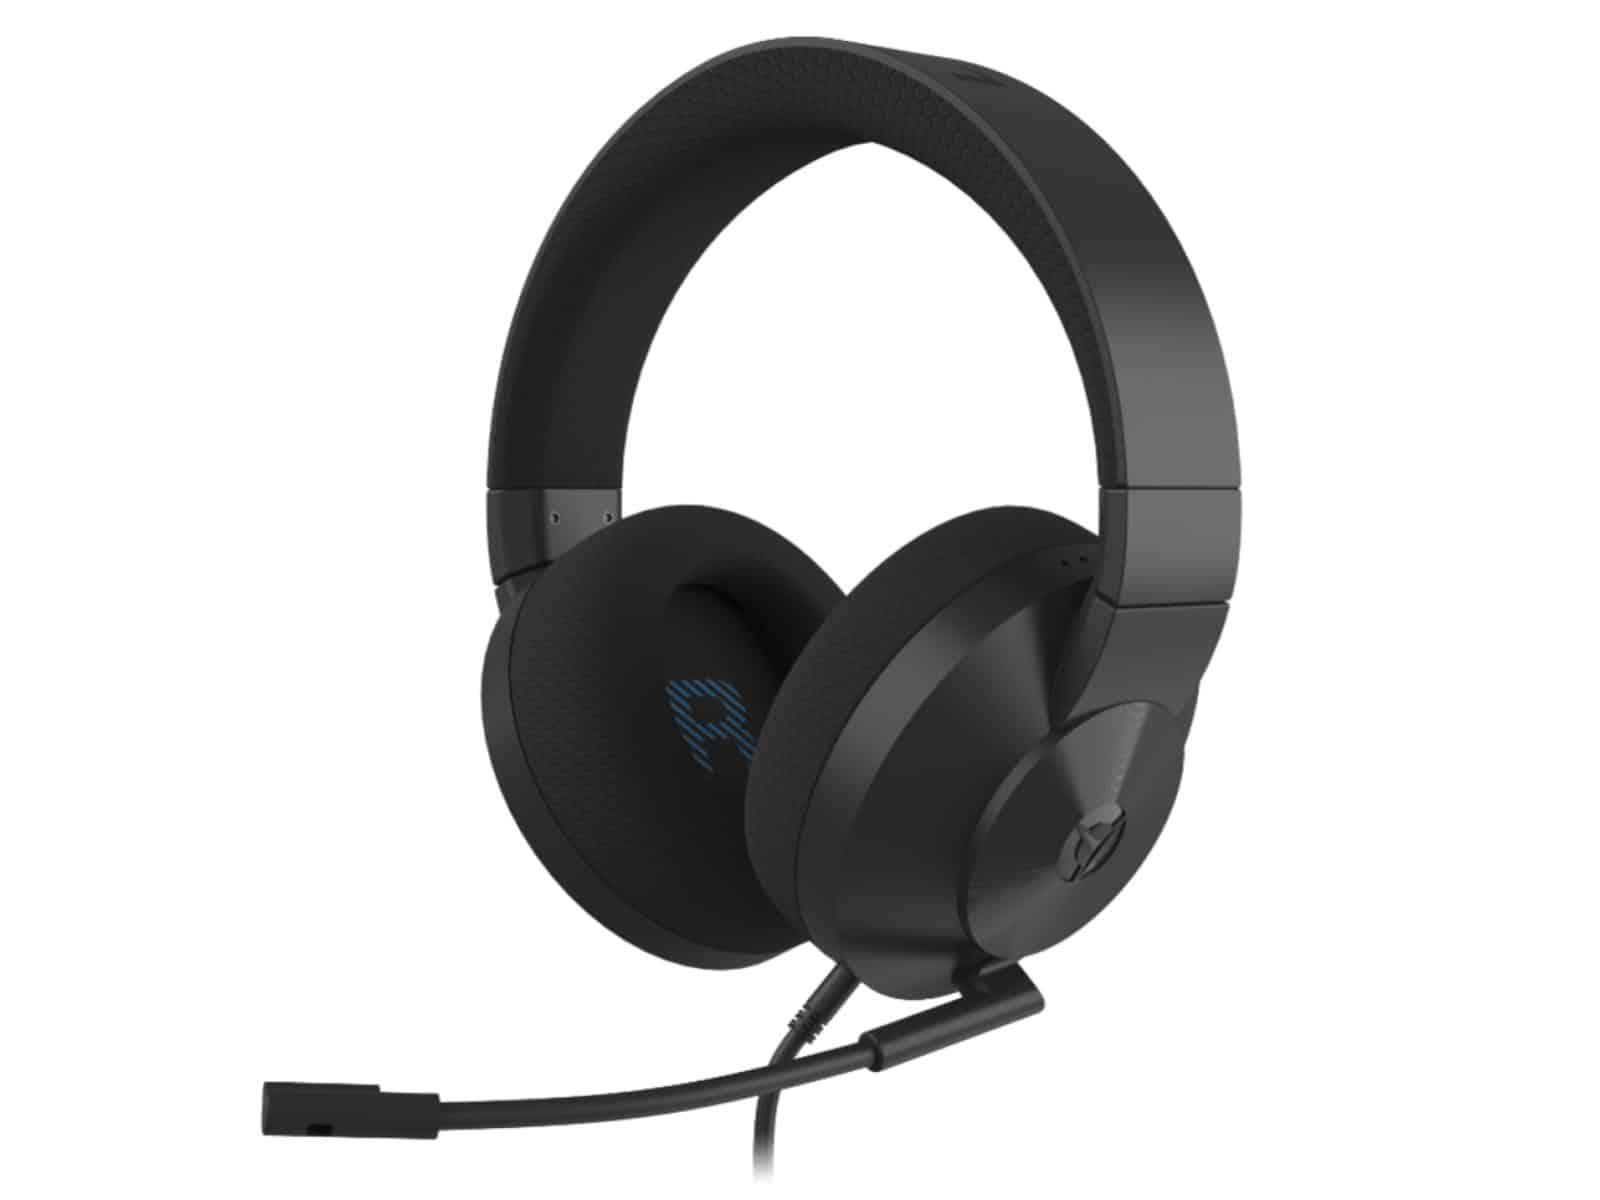 02 Lenovo Legion headsets ces H200 Gaming Headset Rendering 1